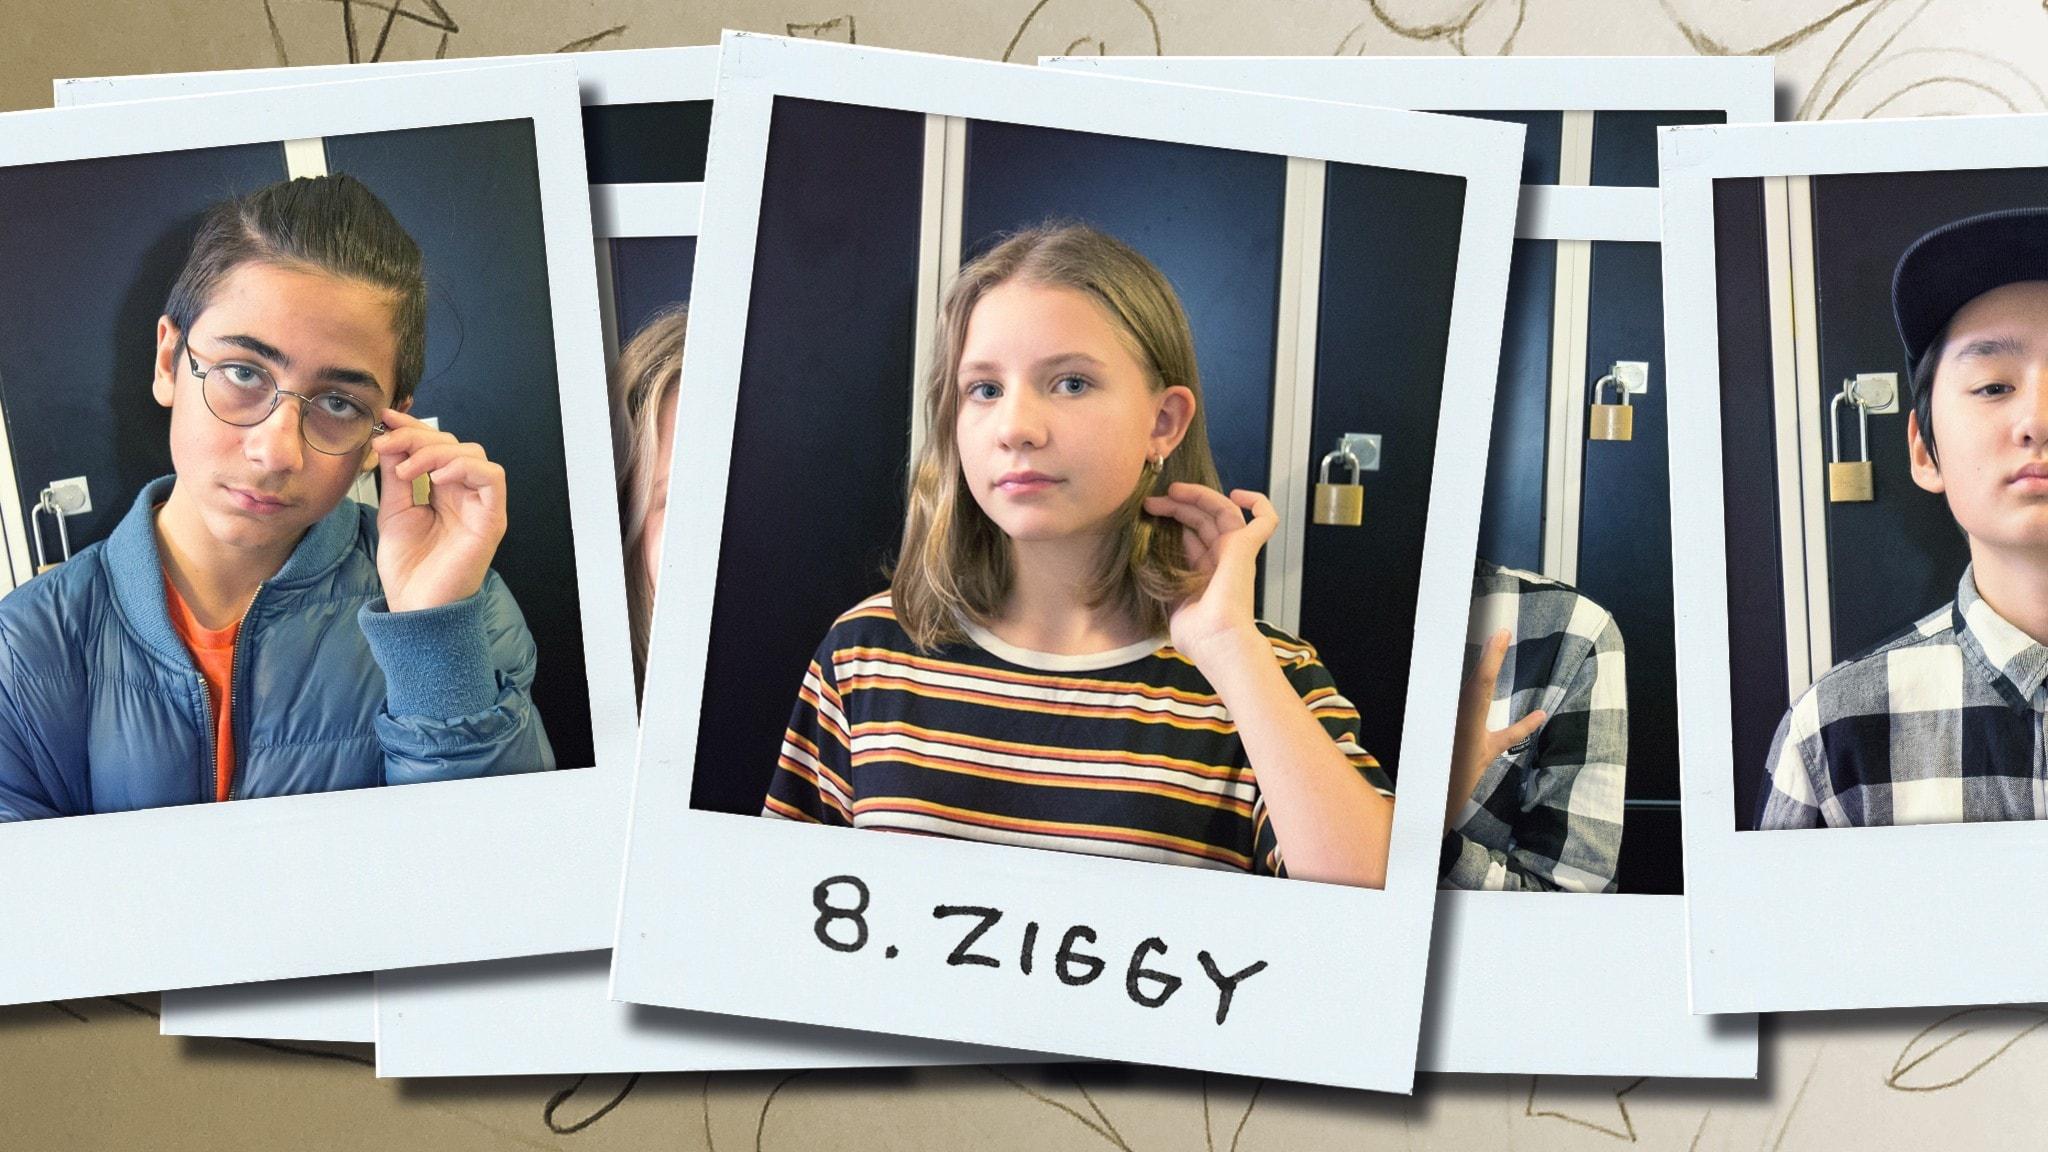 8. Ziggy